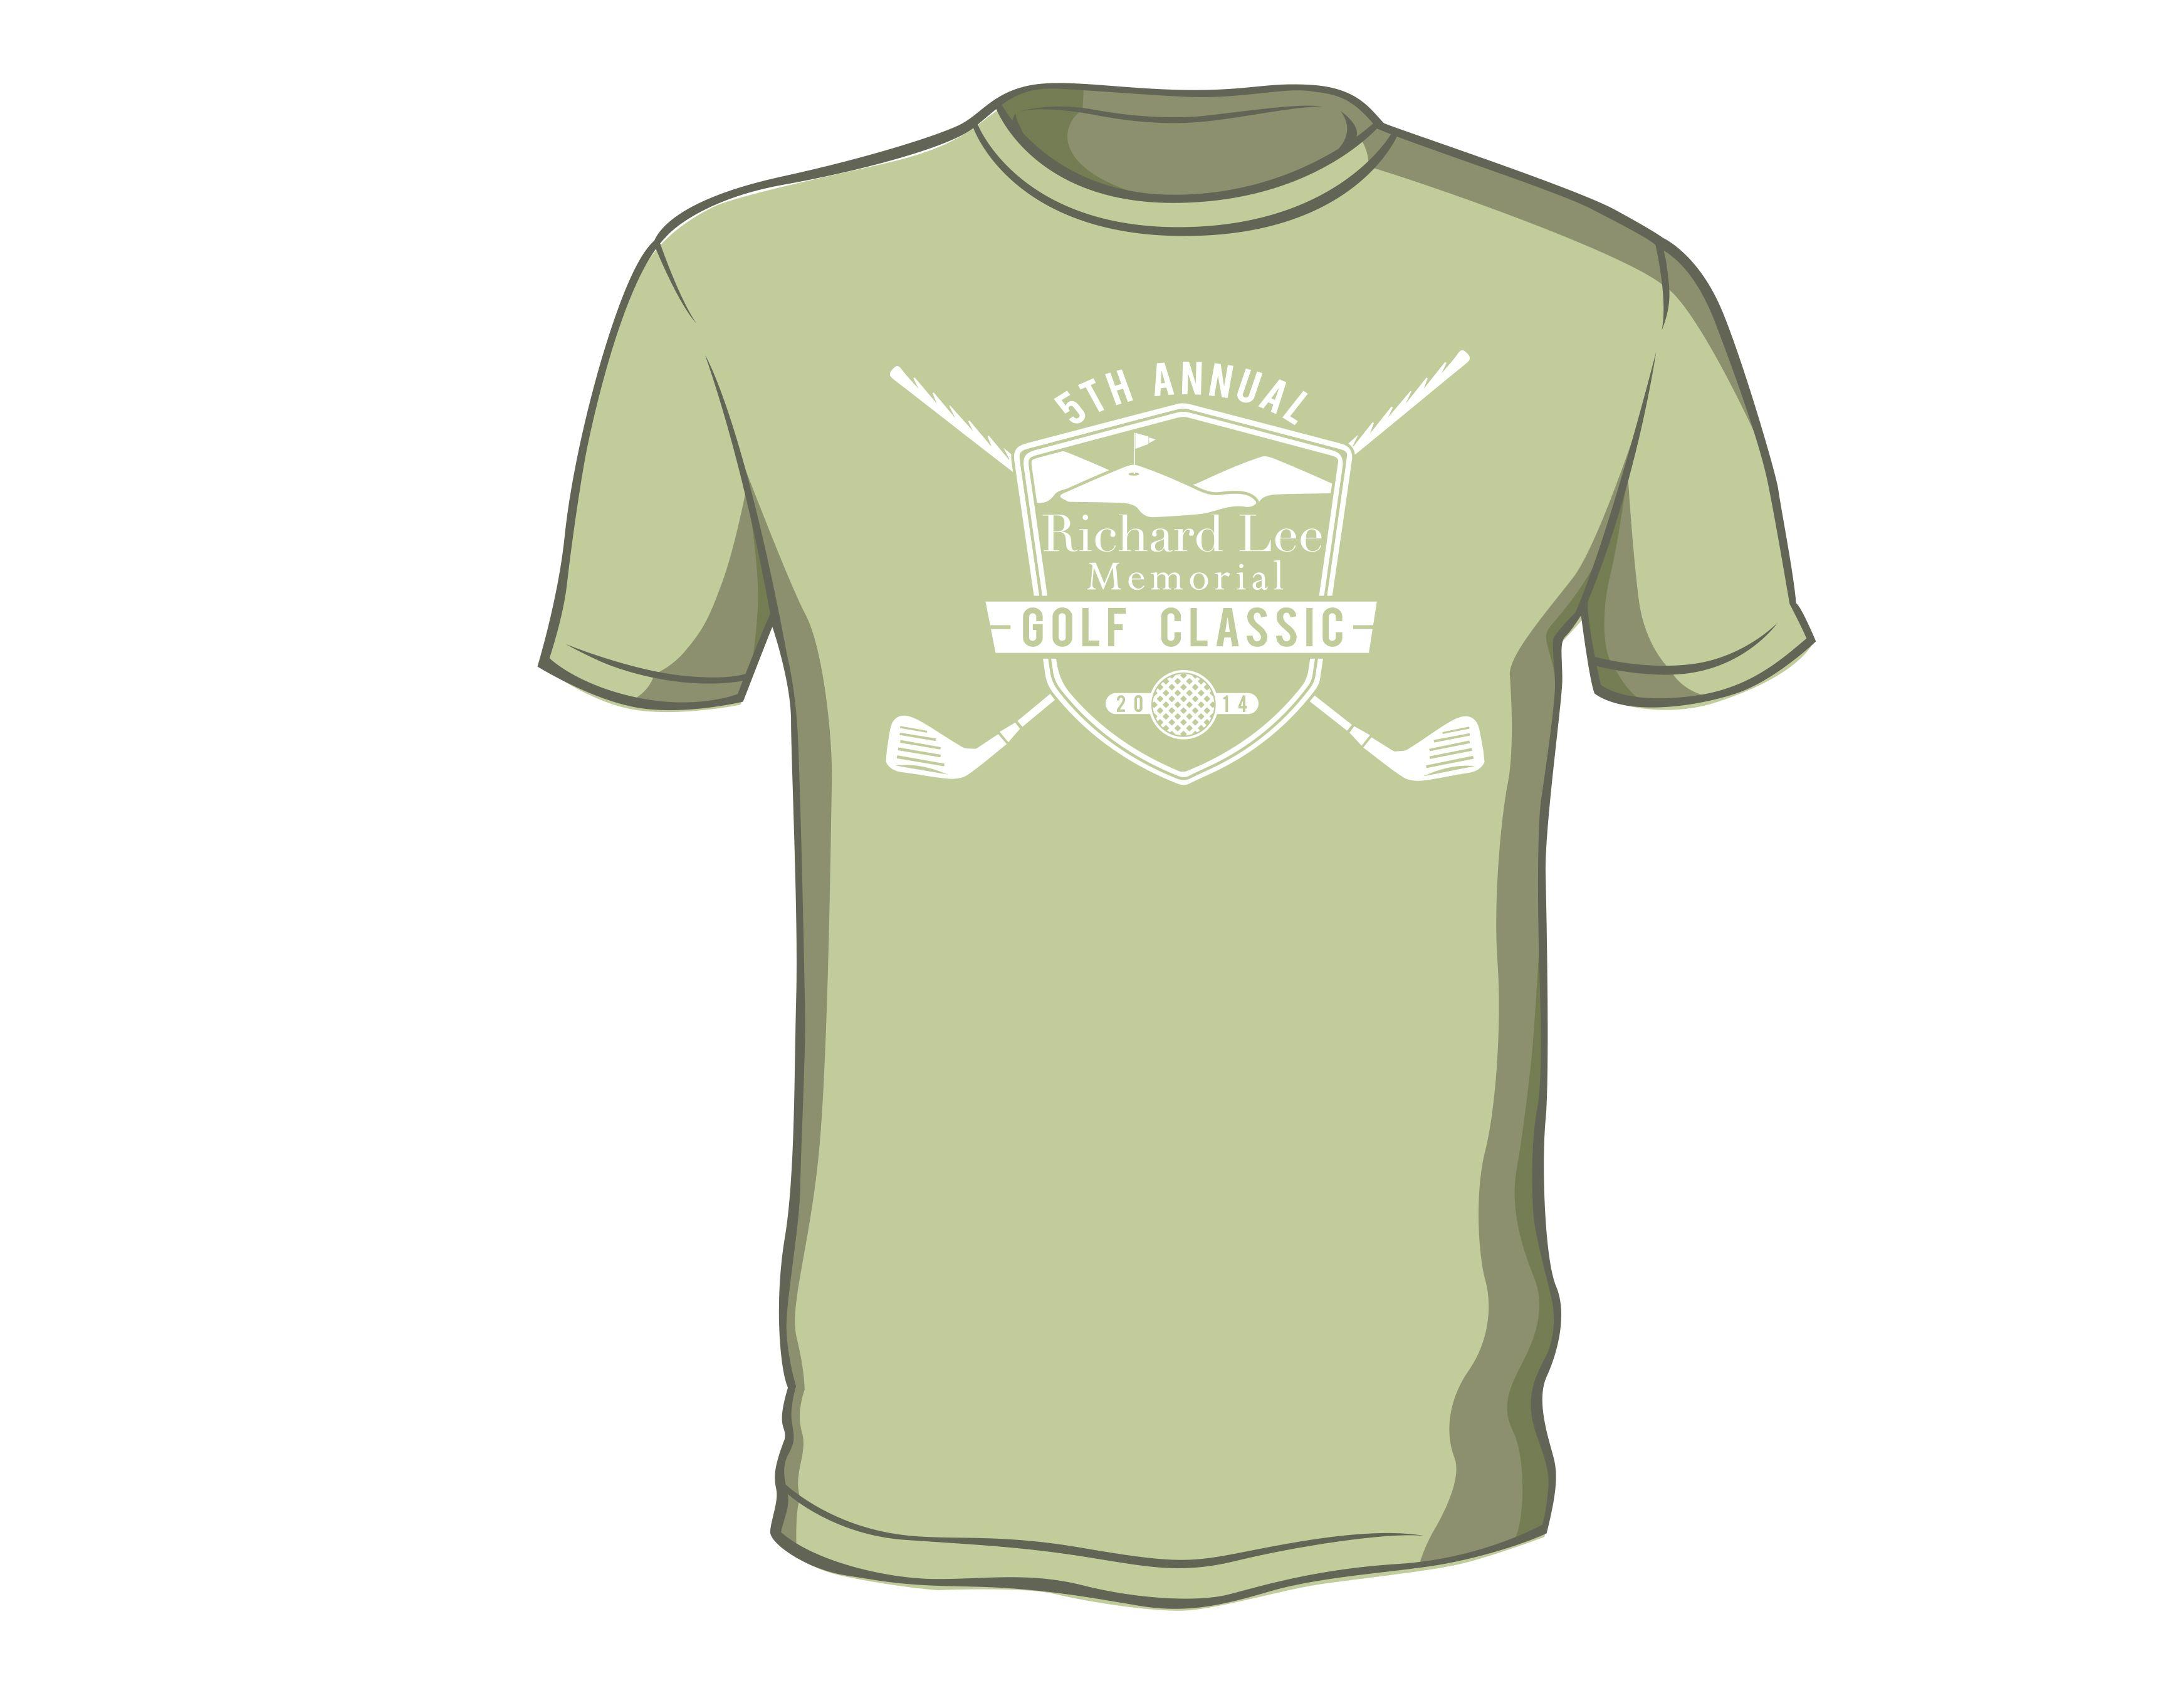 Richard Lee Golf Outing T Shirt Design Helen Demuth Photo